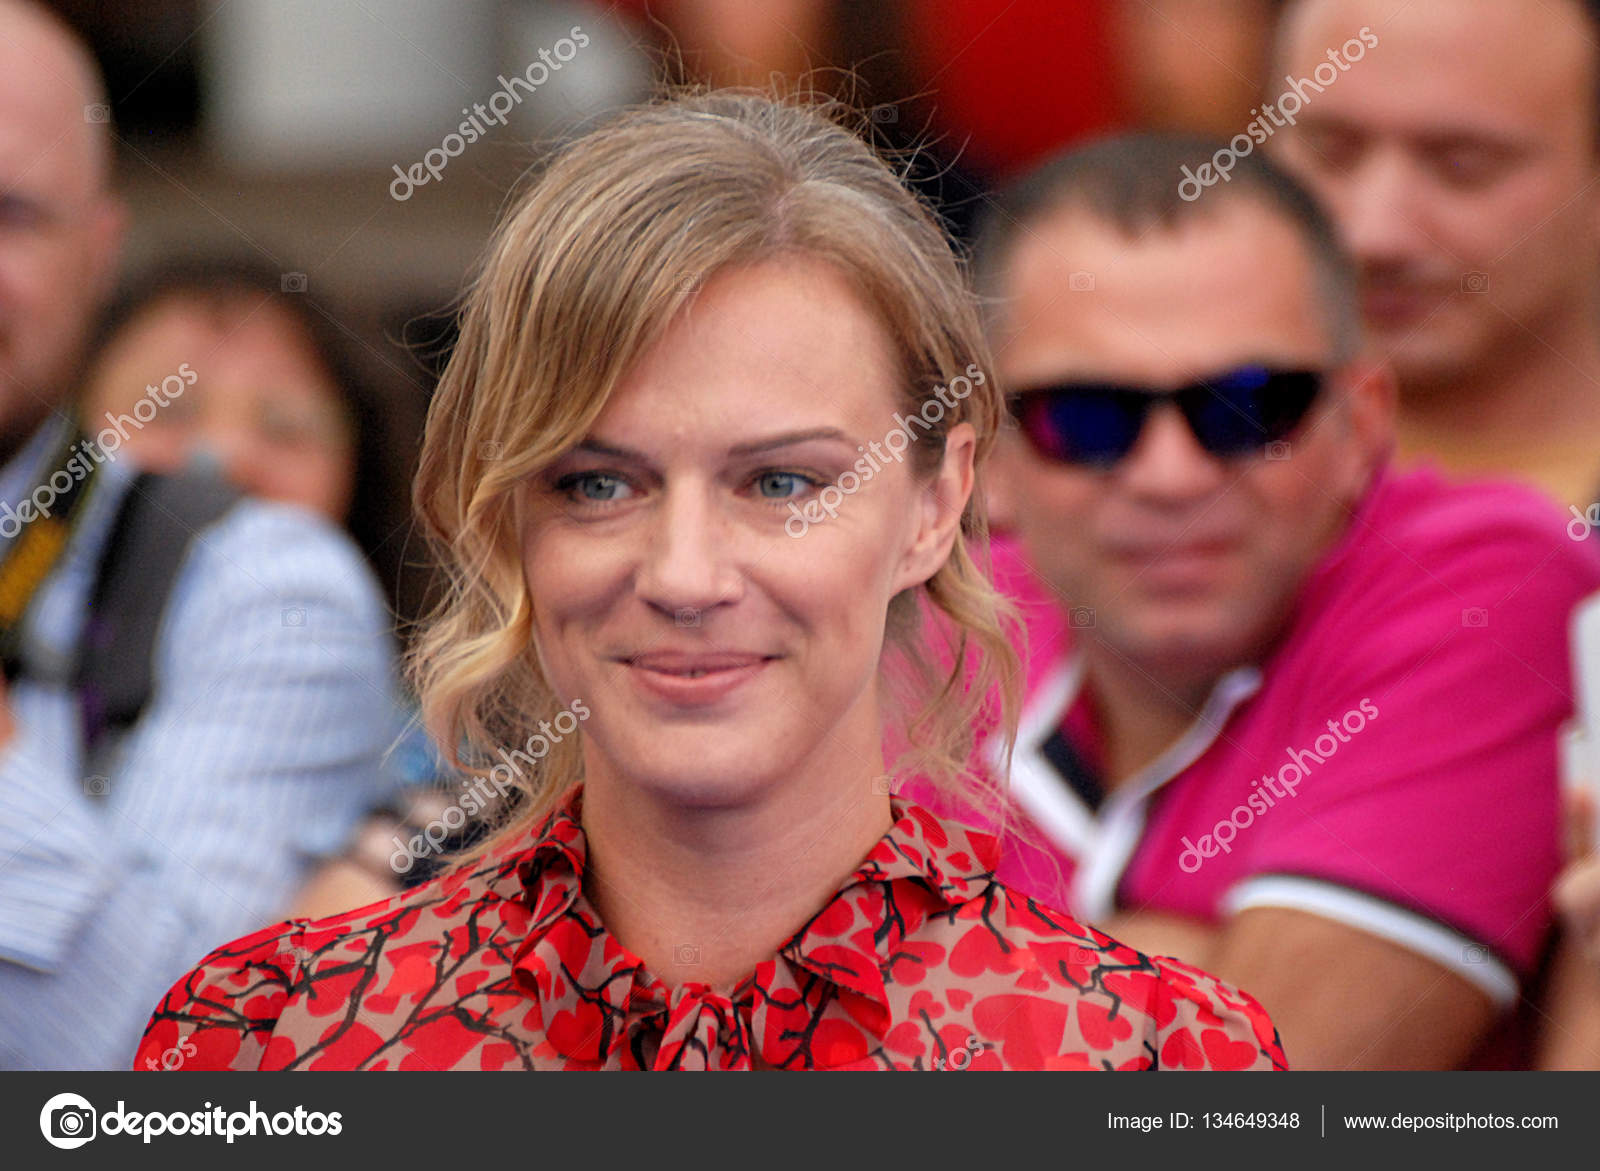 Monica Seles 9 Grand Slam singles titles images